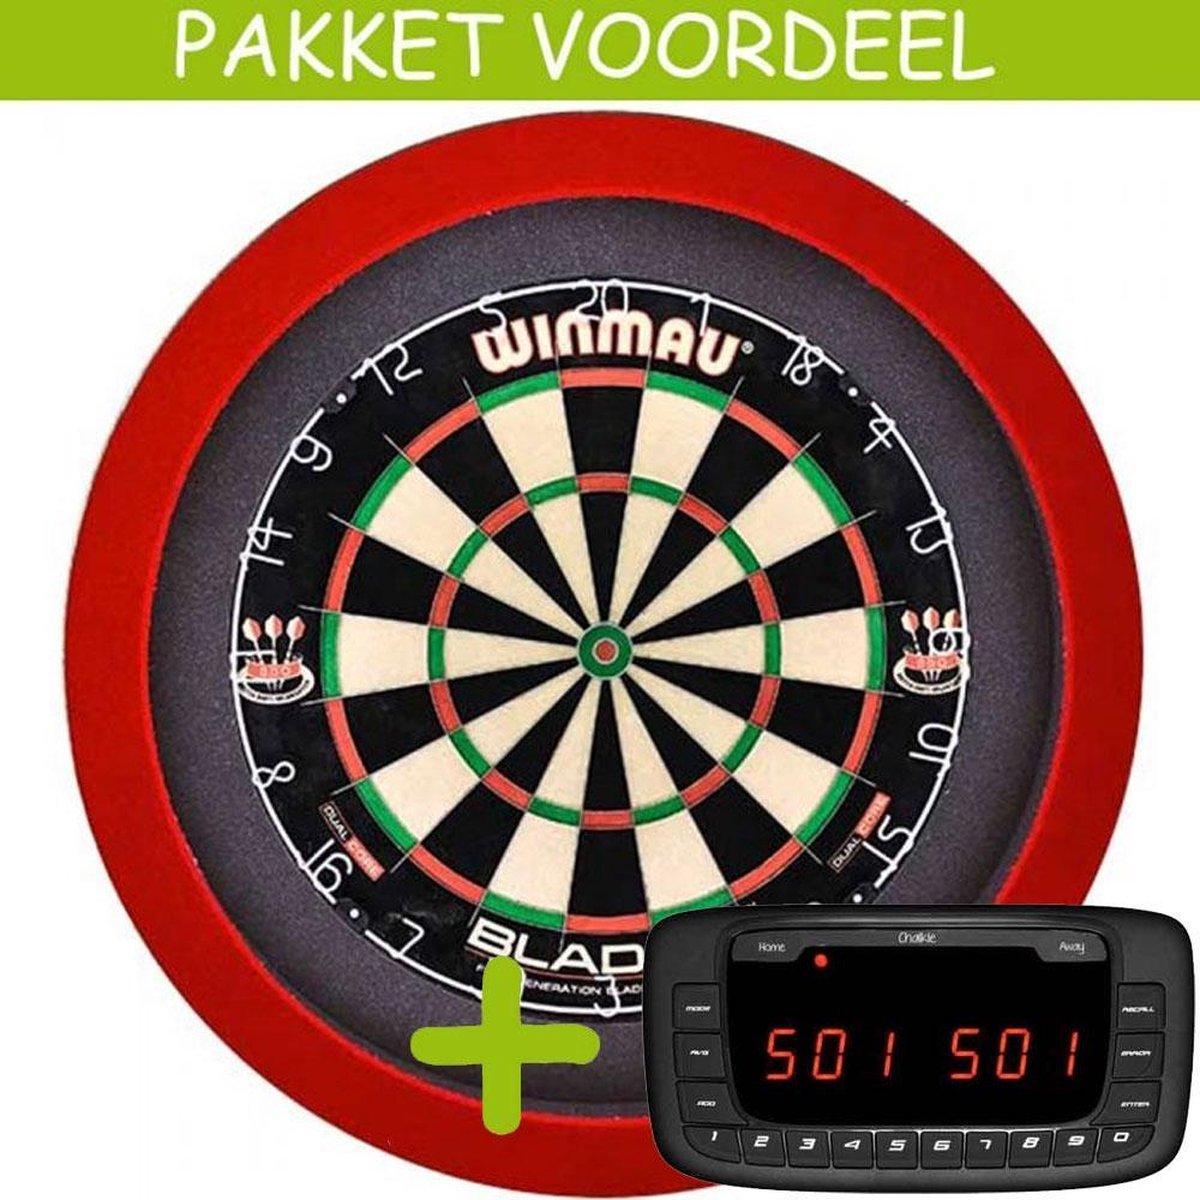 Elektronisch Dart Scorebord VoordeelPakket (Chalkie ) - Blade 5 - Dartbordverlichting Basic (Rood)